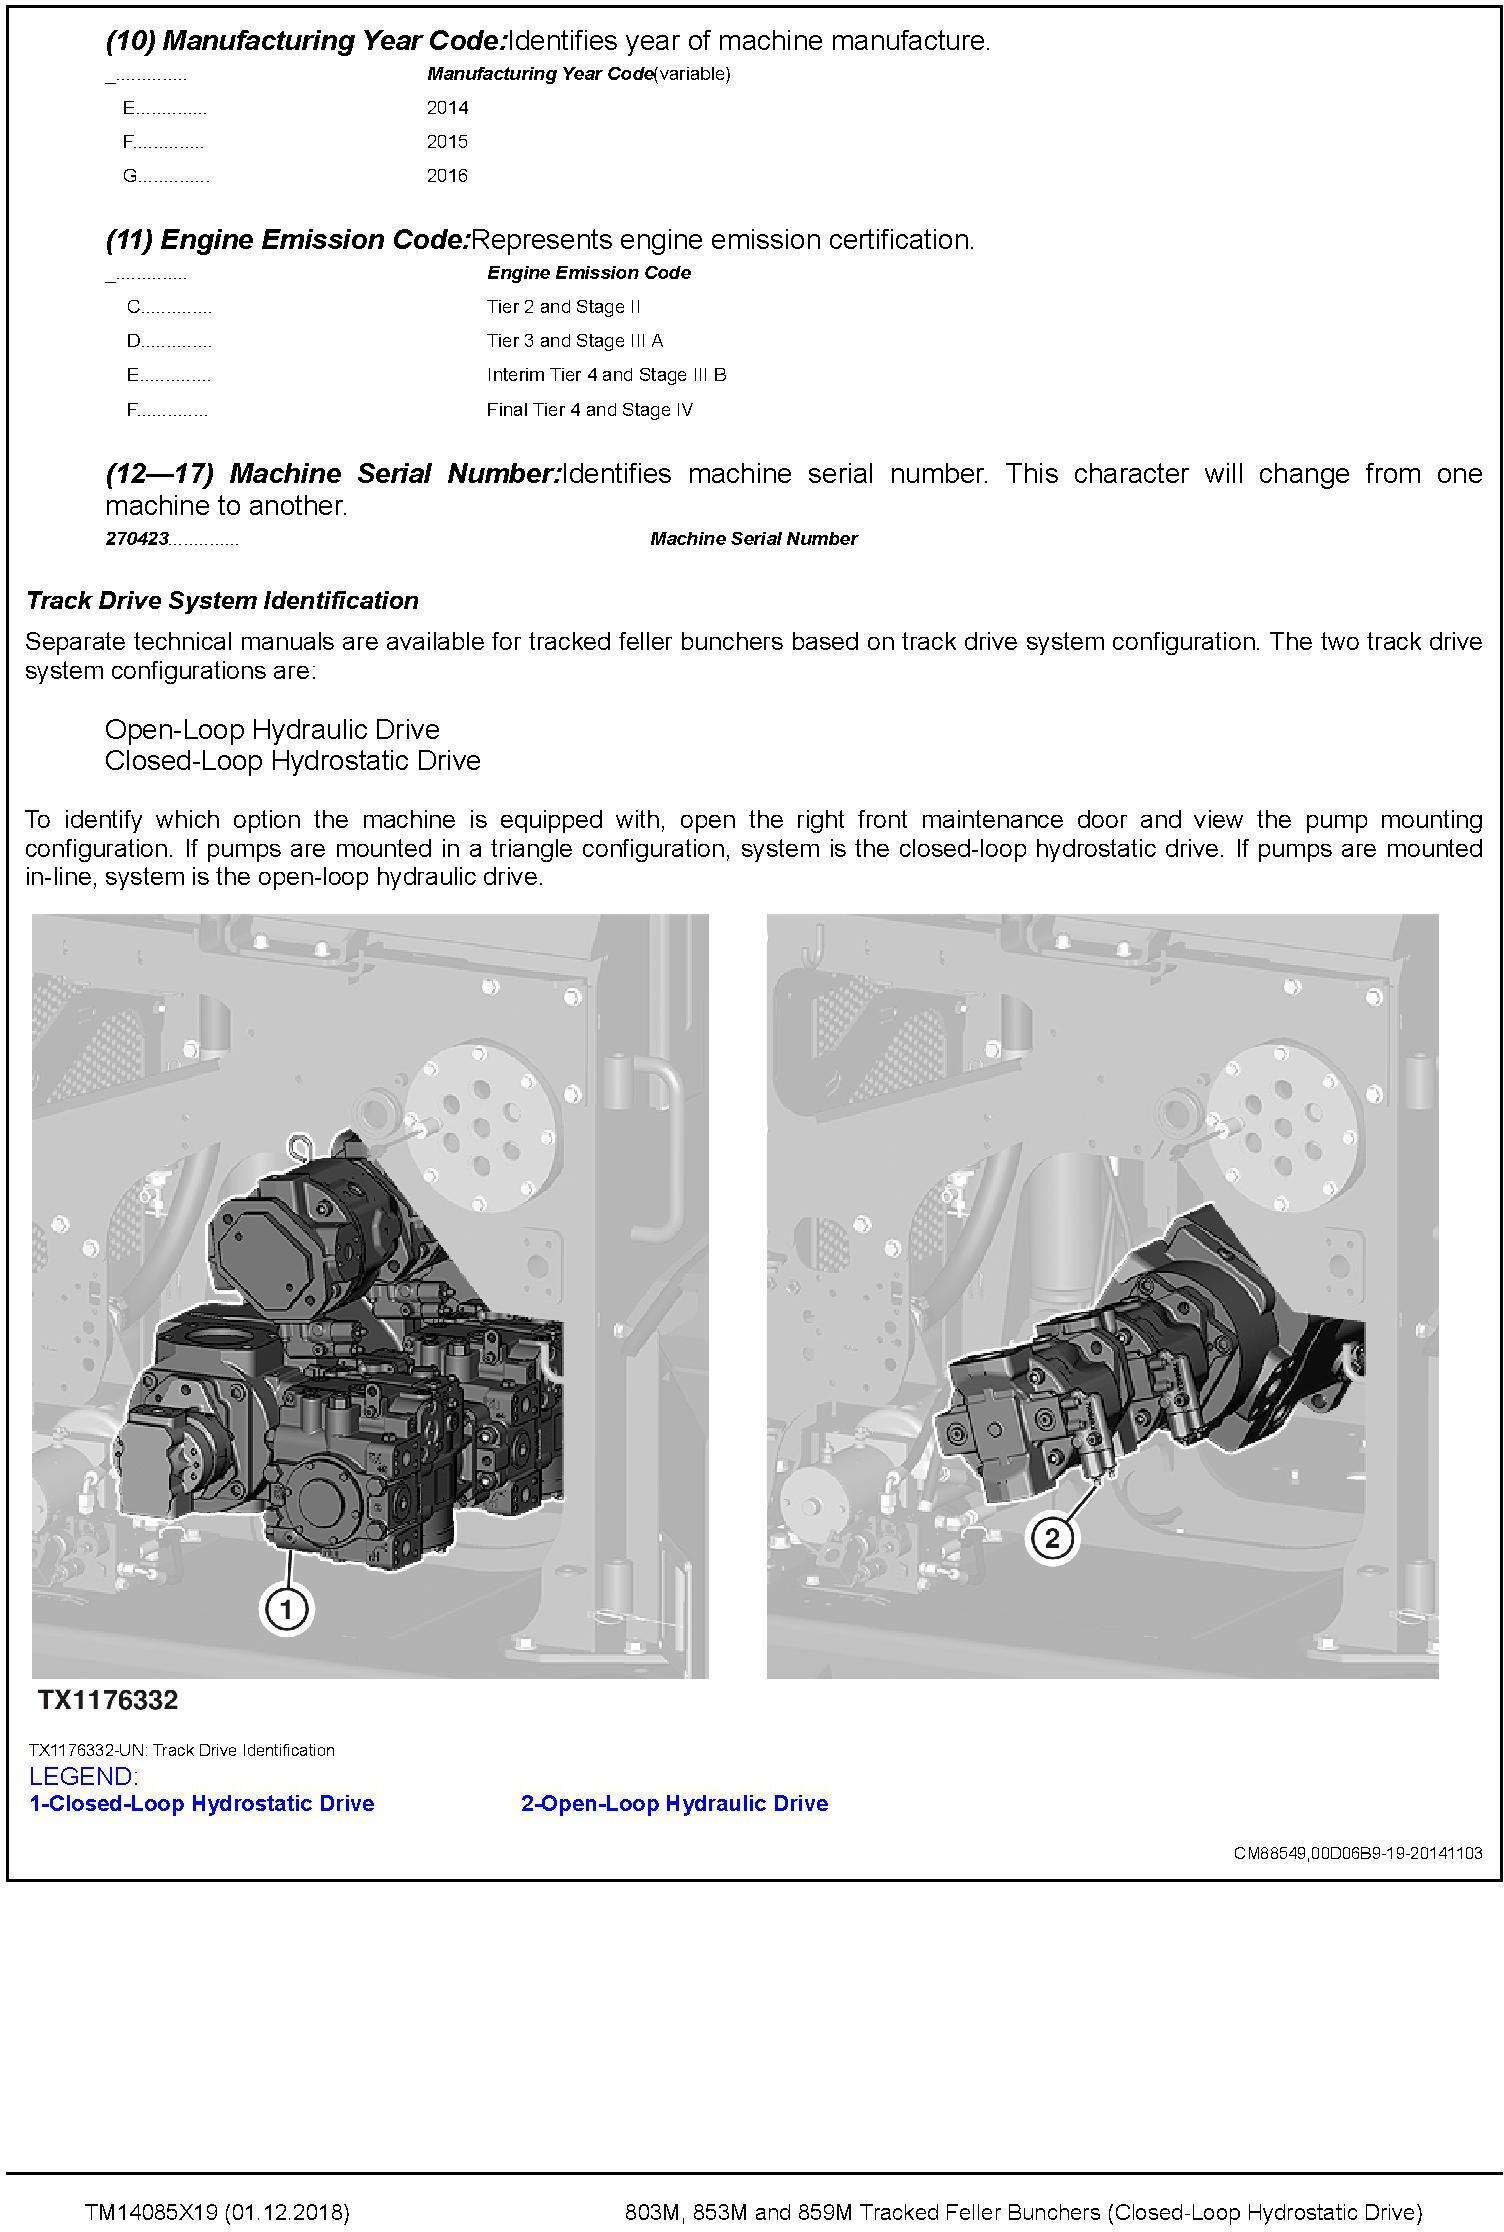 John Deere 803M,853M (SN.F293917-,L343918-) Feller Buncher(Closed-Loop) Diagnostic Manual TM14085X19 - 1